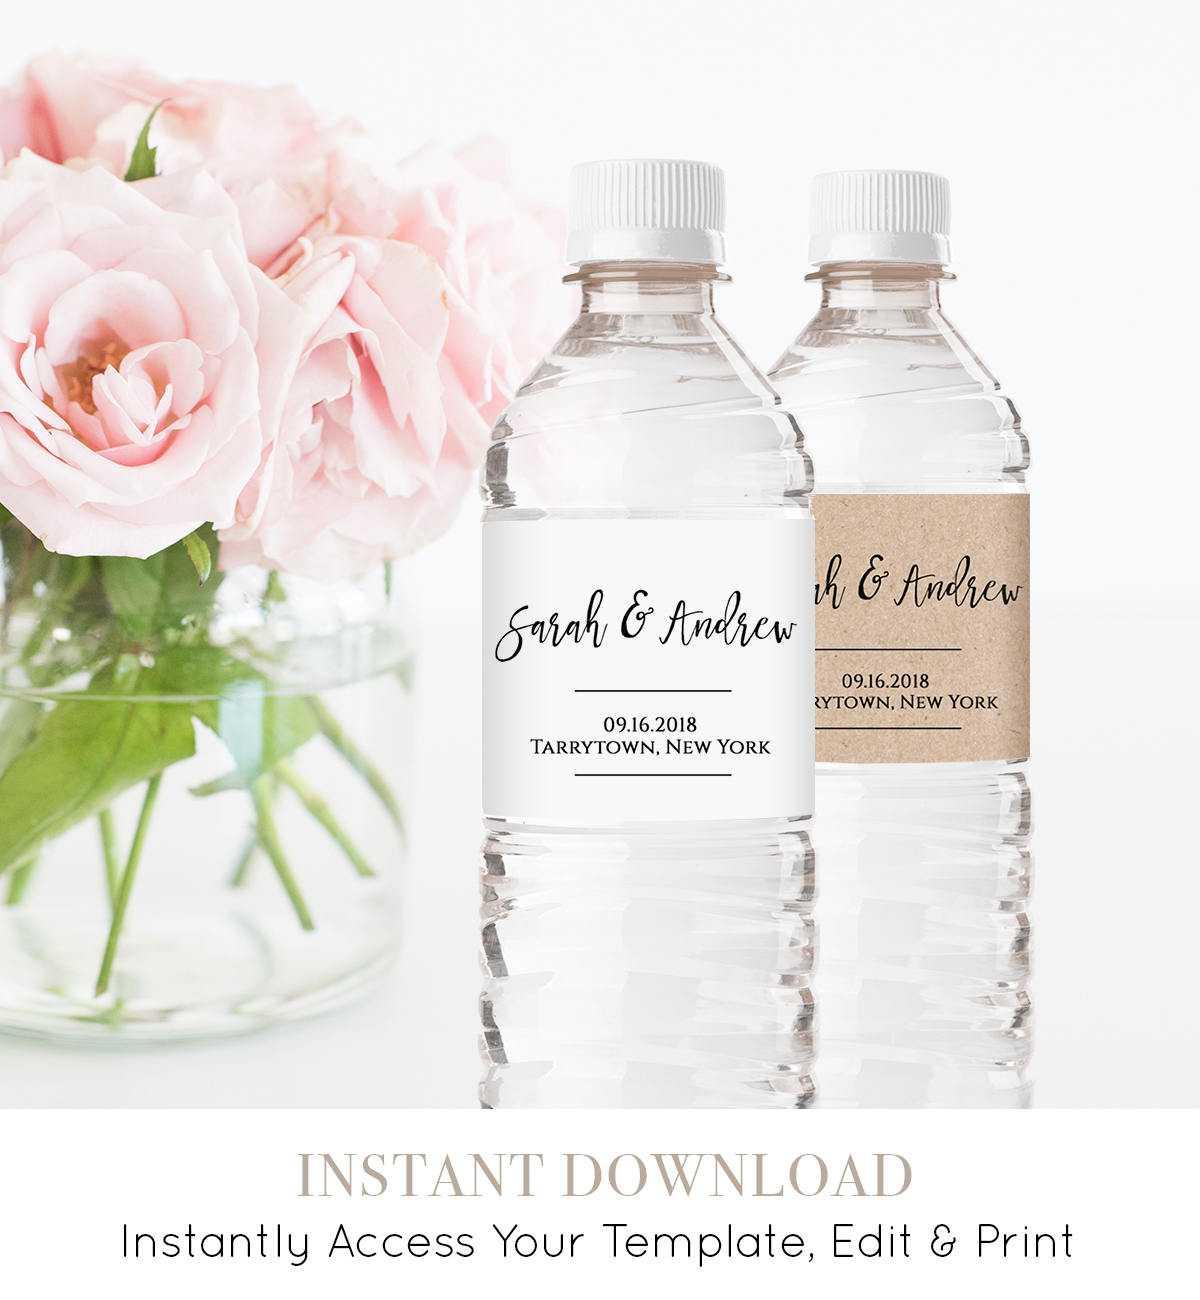 Wedding Water Bottle Label Template, Printable, Diy Throughout Diy Water Bottle Label Template